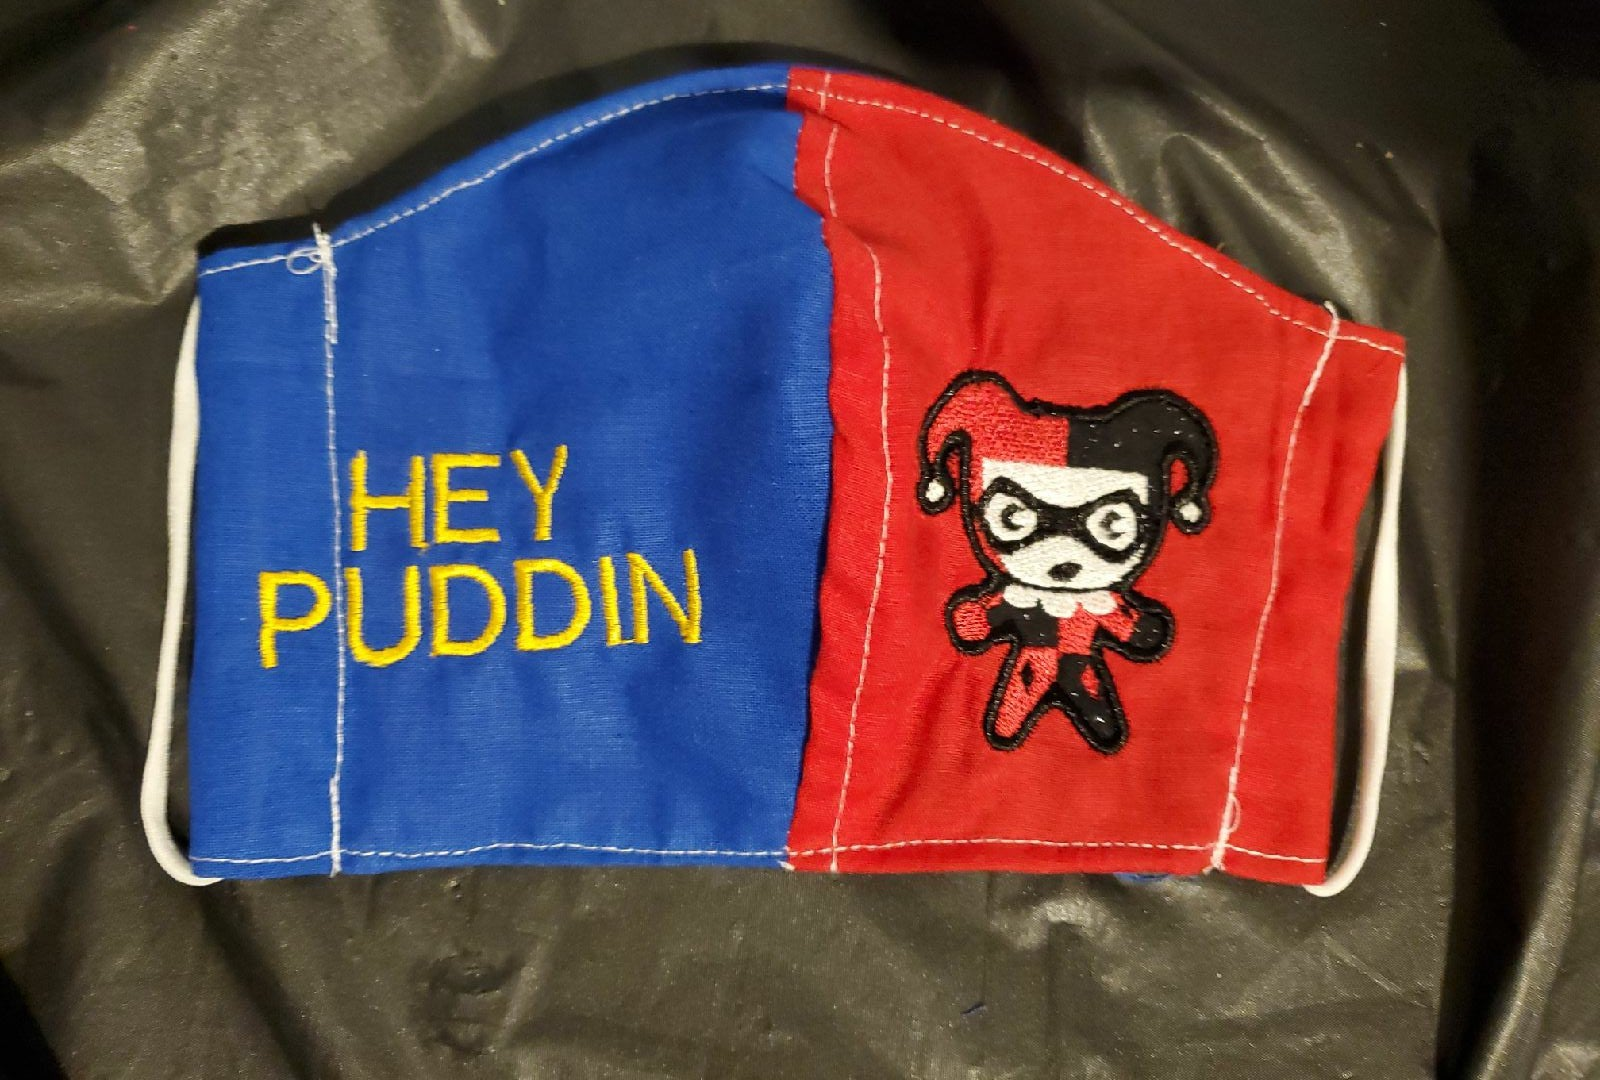 Hey puddin harlequinn fandom embroidered